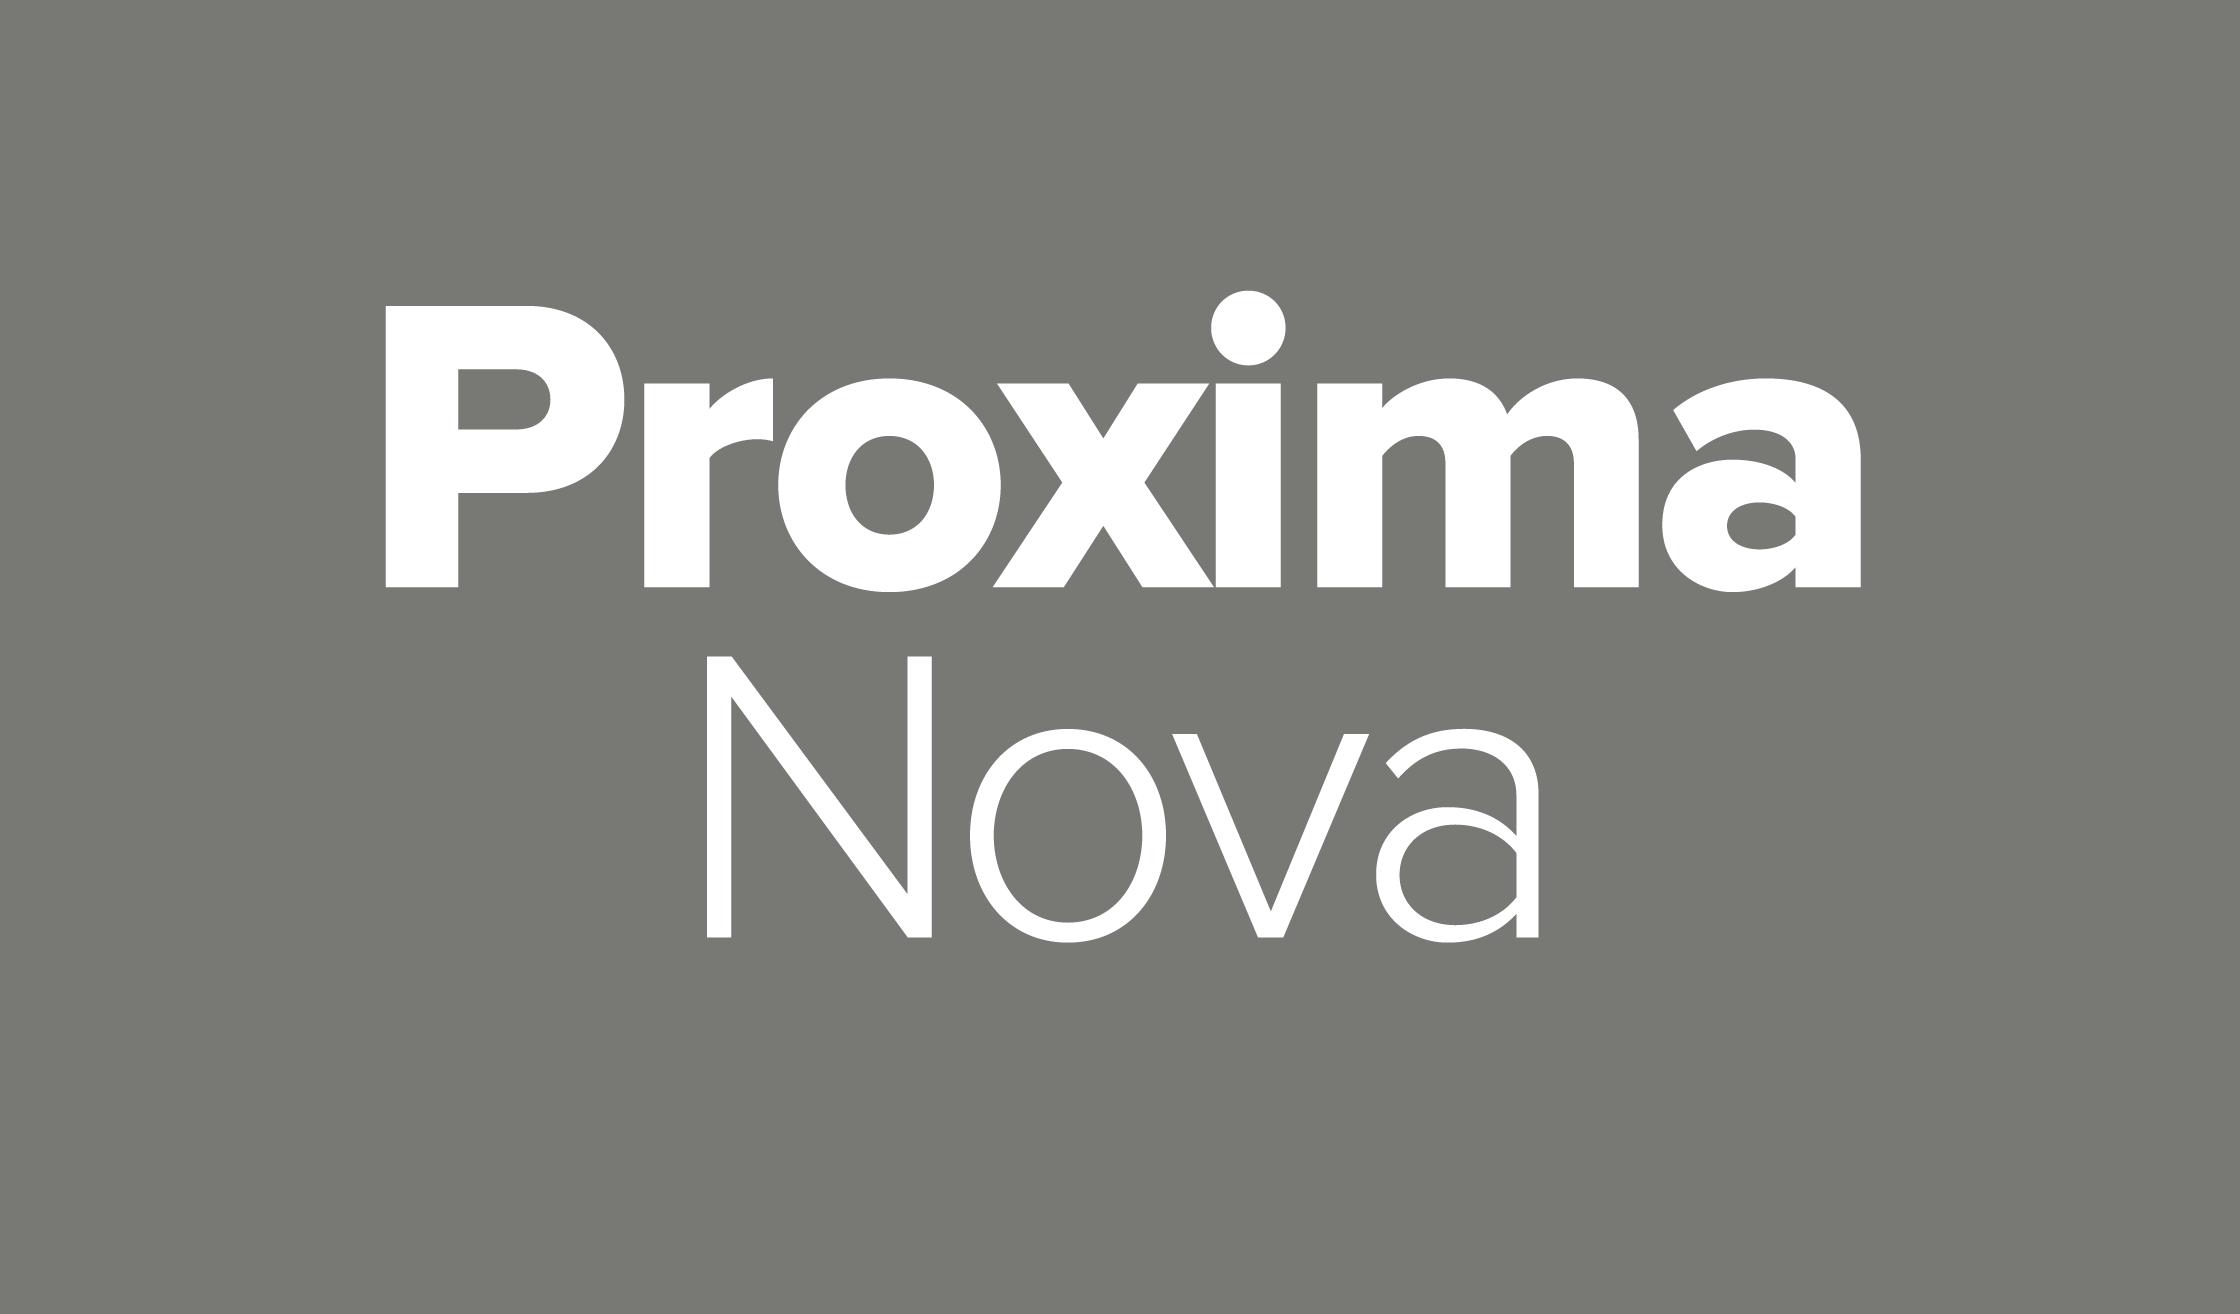 Proxima Nova Beautiful Body Font For Blogs Popular Fonts Logo Fonts Feminine Fonts